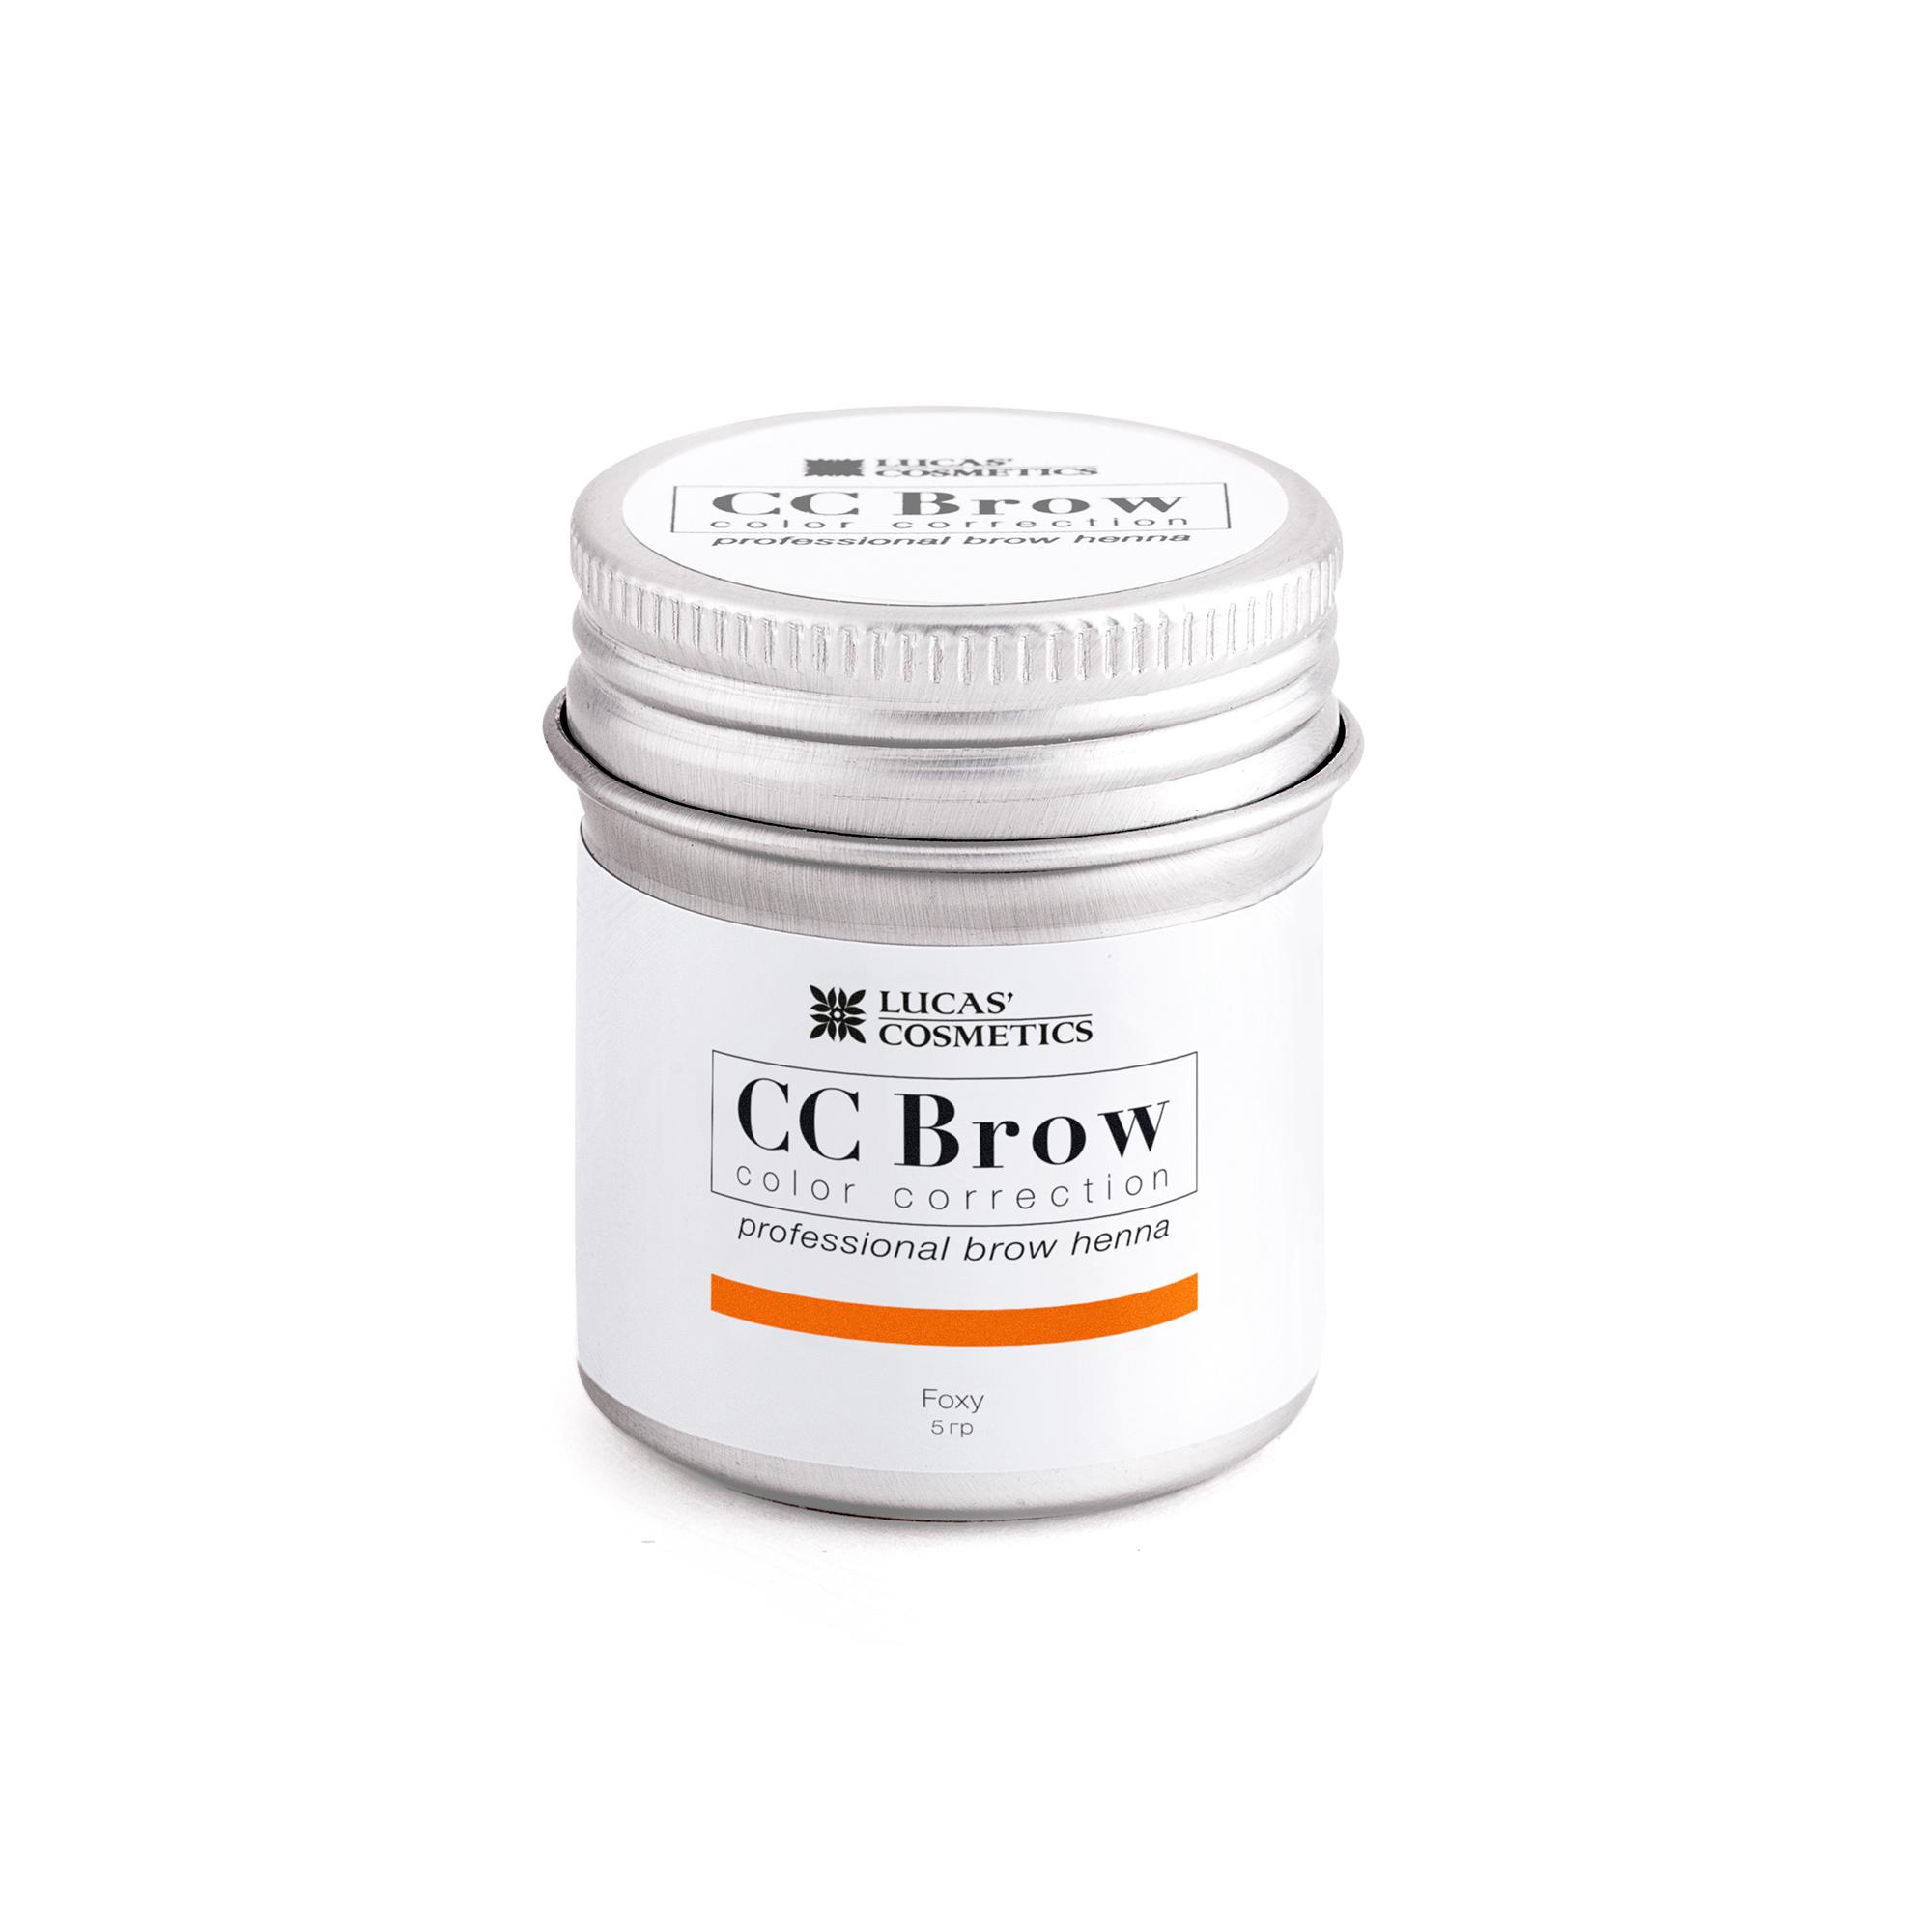 LUCAS' COSMETICS Хна для бровей в баночке (рыжий) / CC Brow (foxy), 5 гр